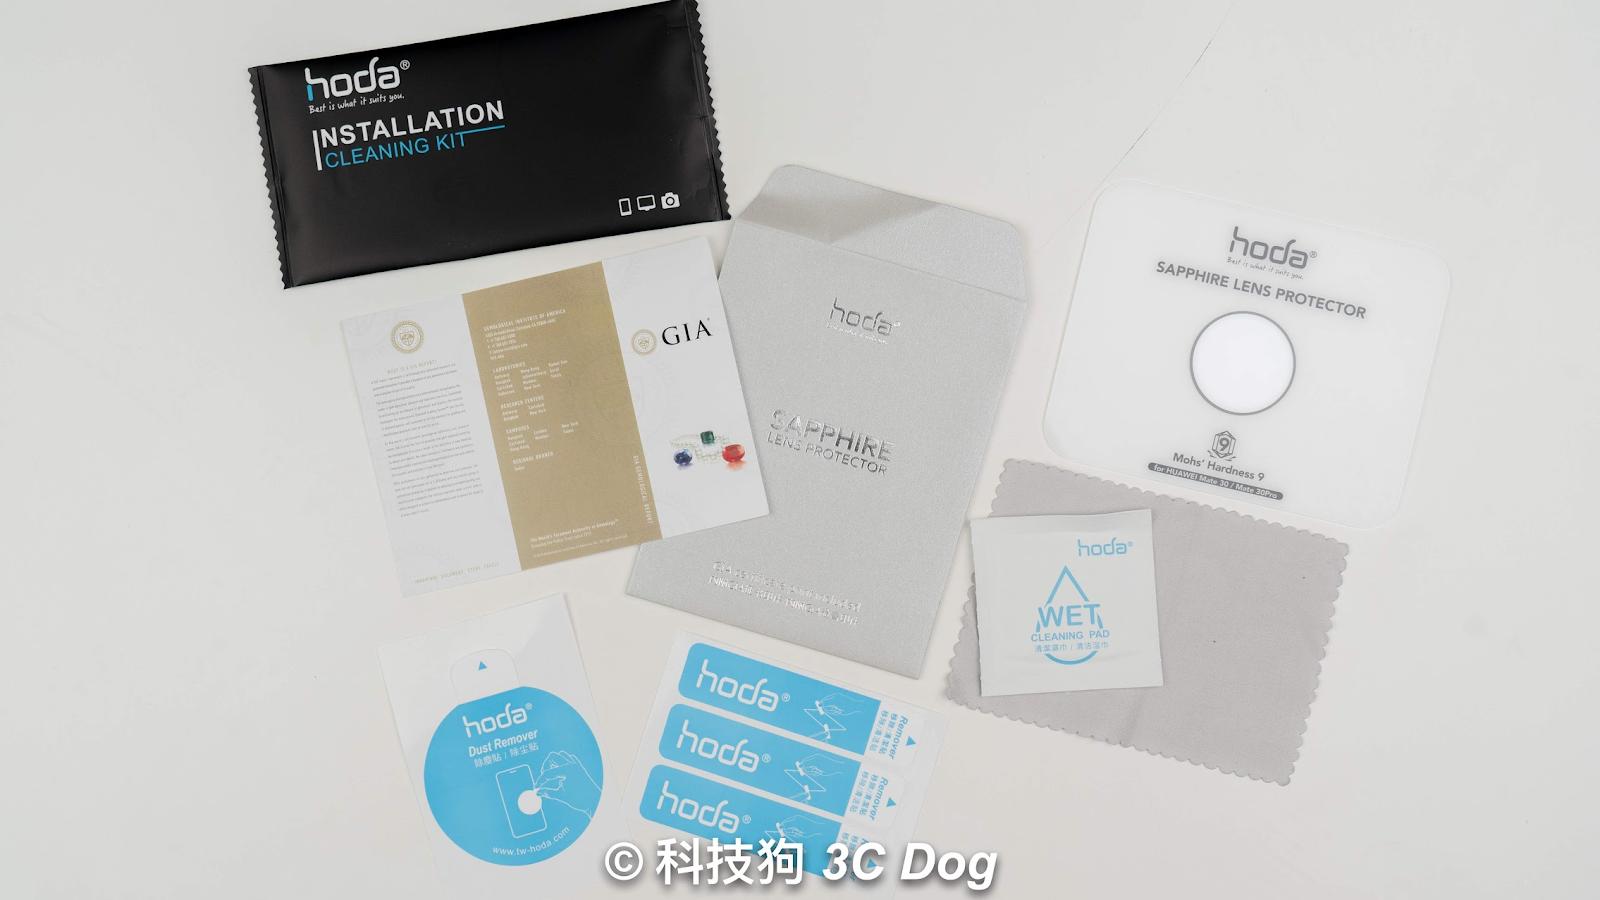 Android 鏡頭保護貼開箱 Galaxy Note10 系列 / Google Pixel 4 系列 / 華為 Mate30 Pro - 4